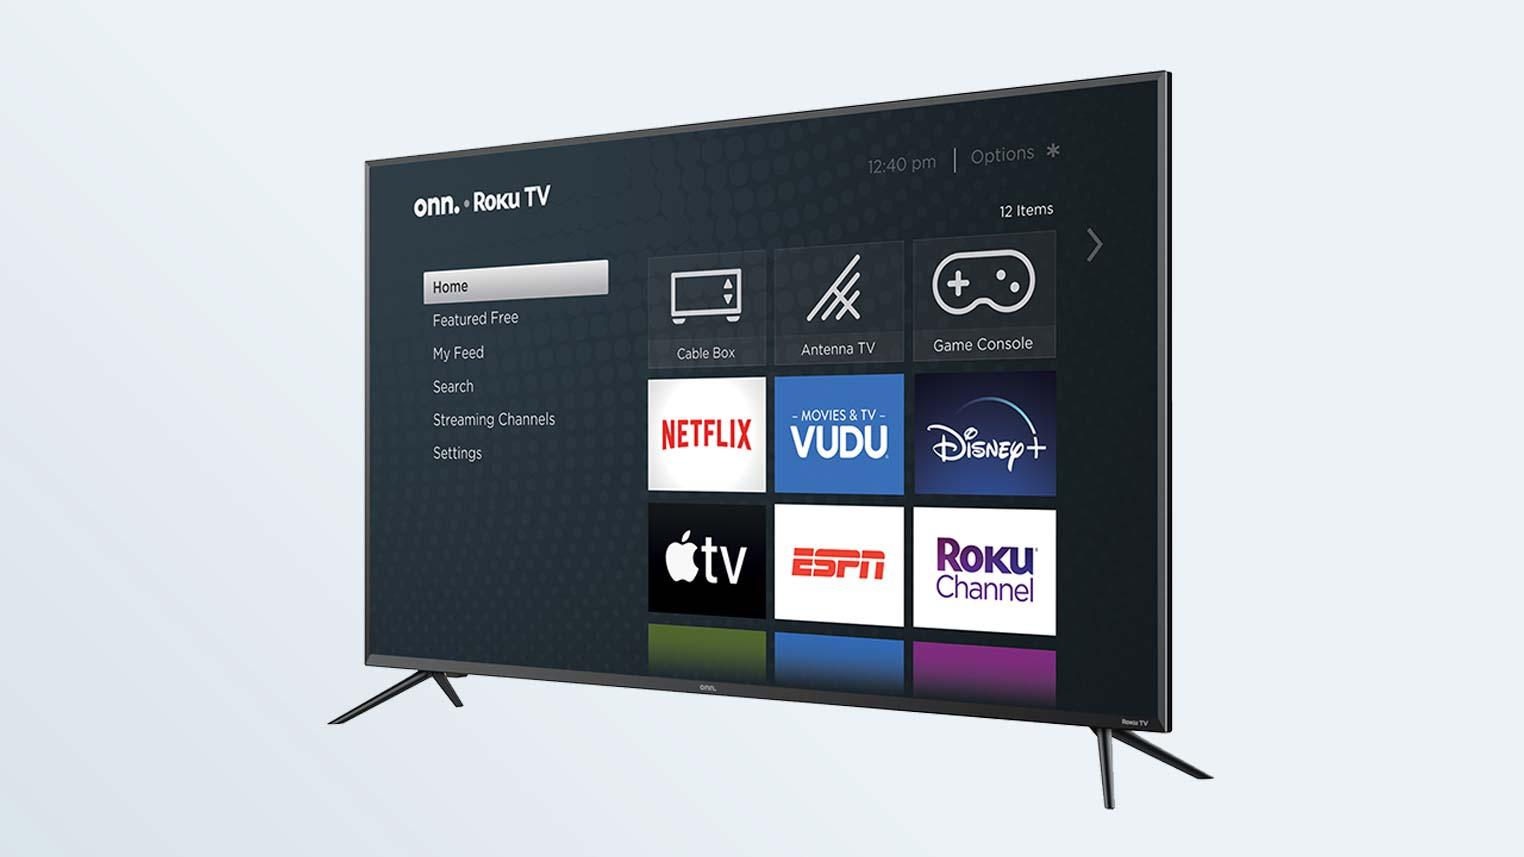 Best Roku TVs: Onn 50-inch 4K Roku Smart TV